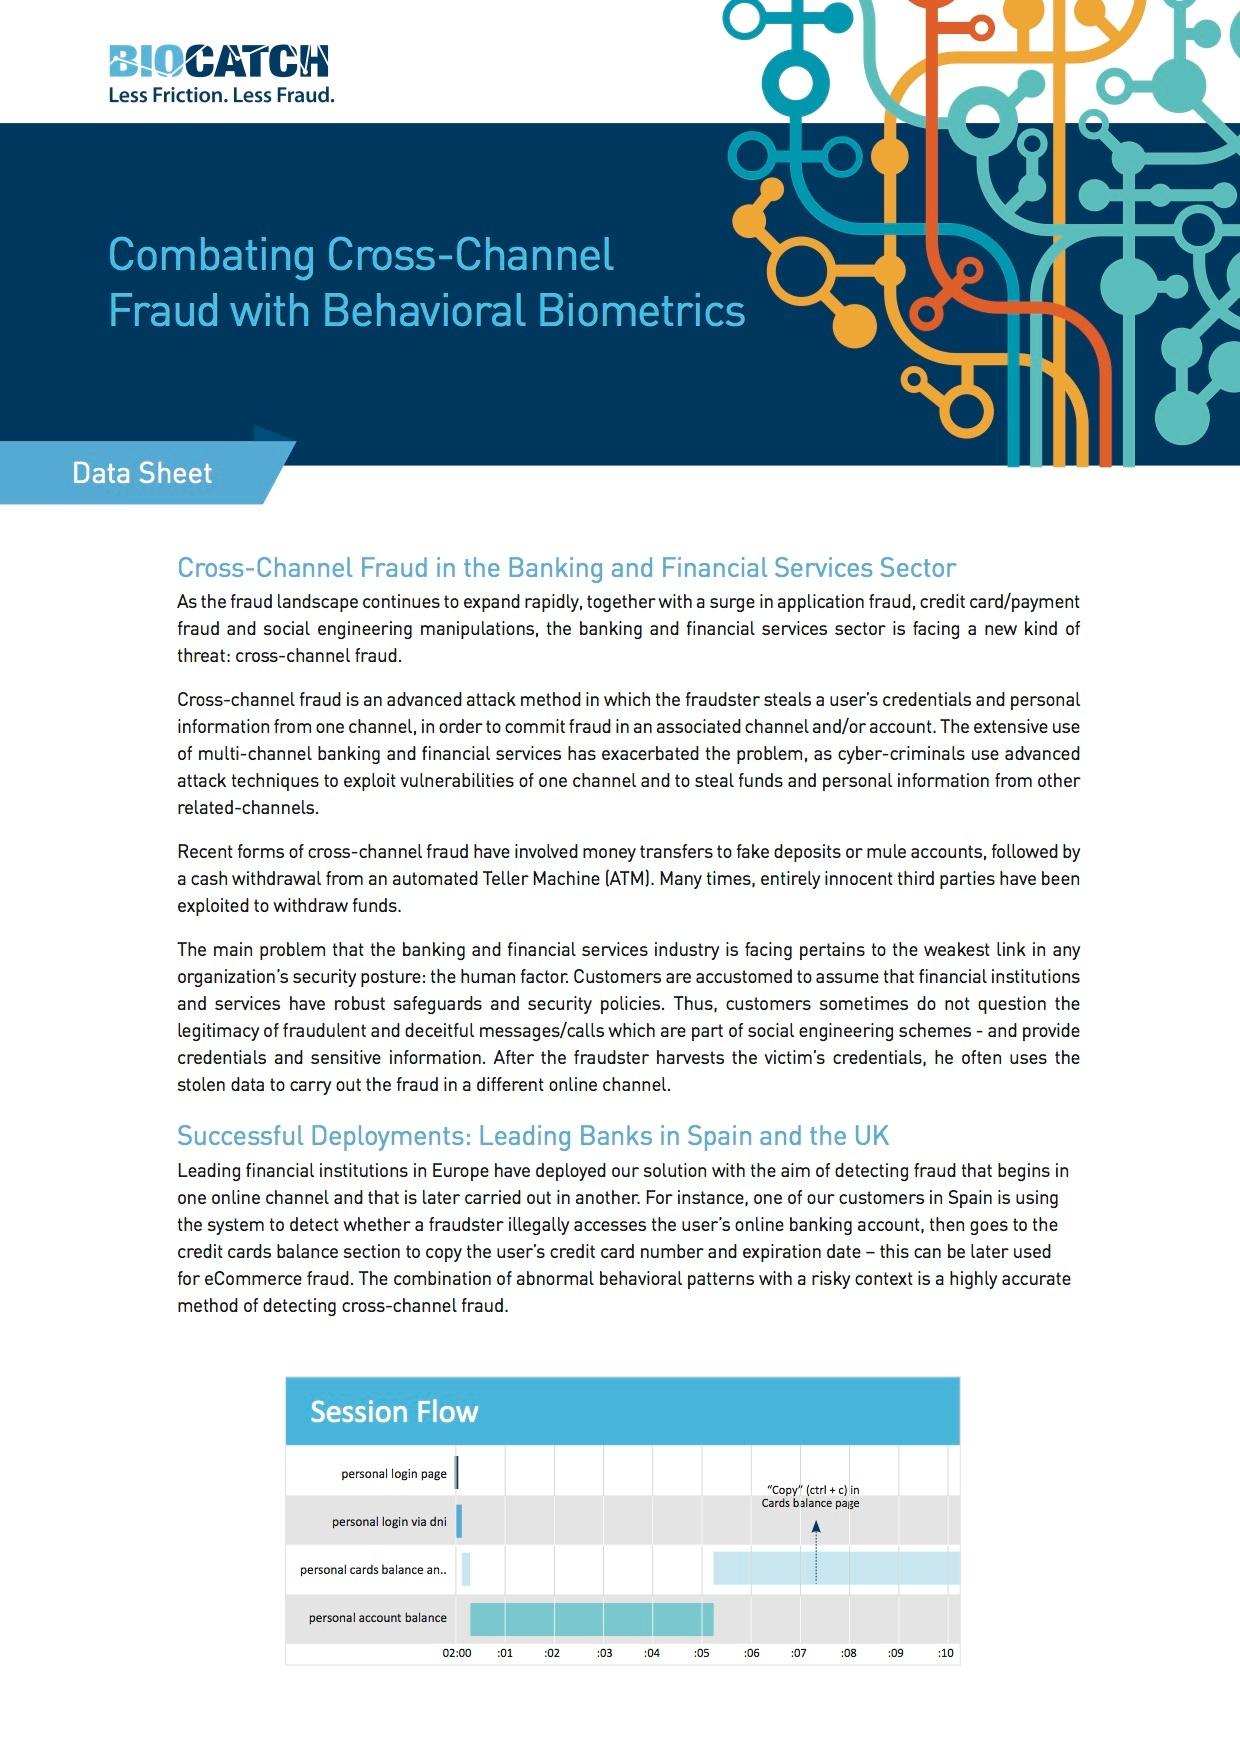 Cross-Channel Fraud Data Sheet.jpg